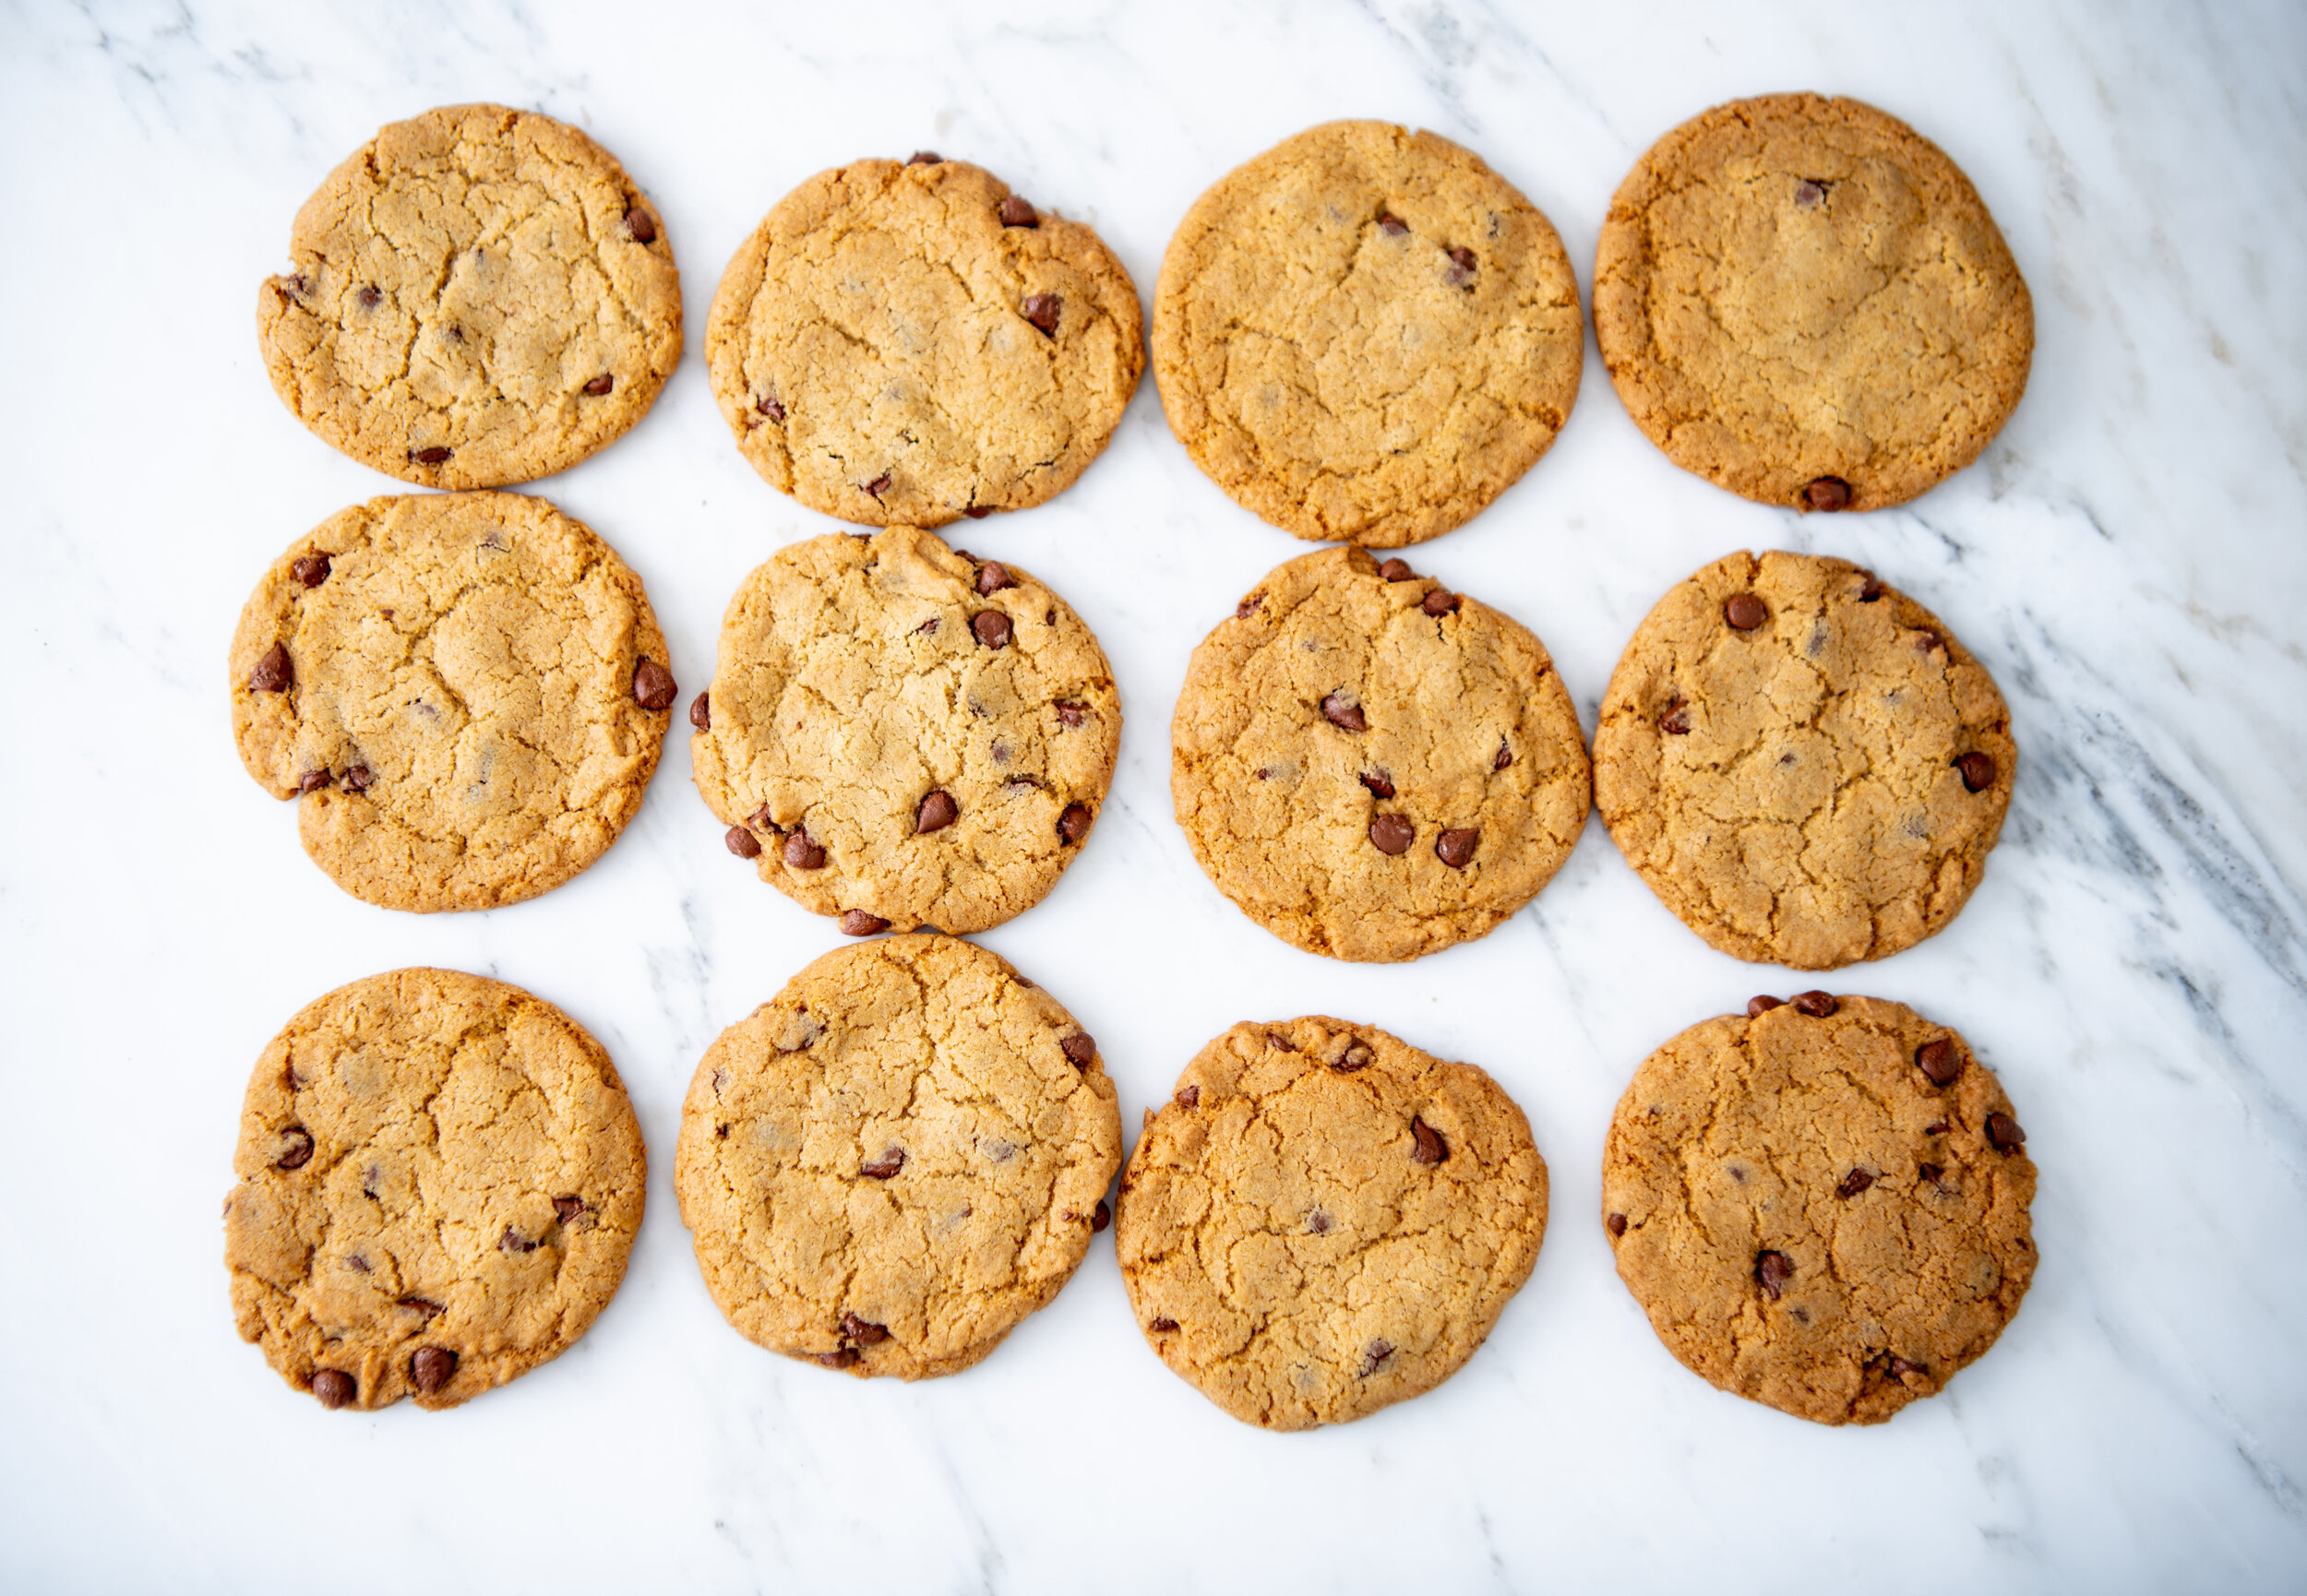 LOV Bakery Organic Vegan Chocolate Chip Cookies